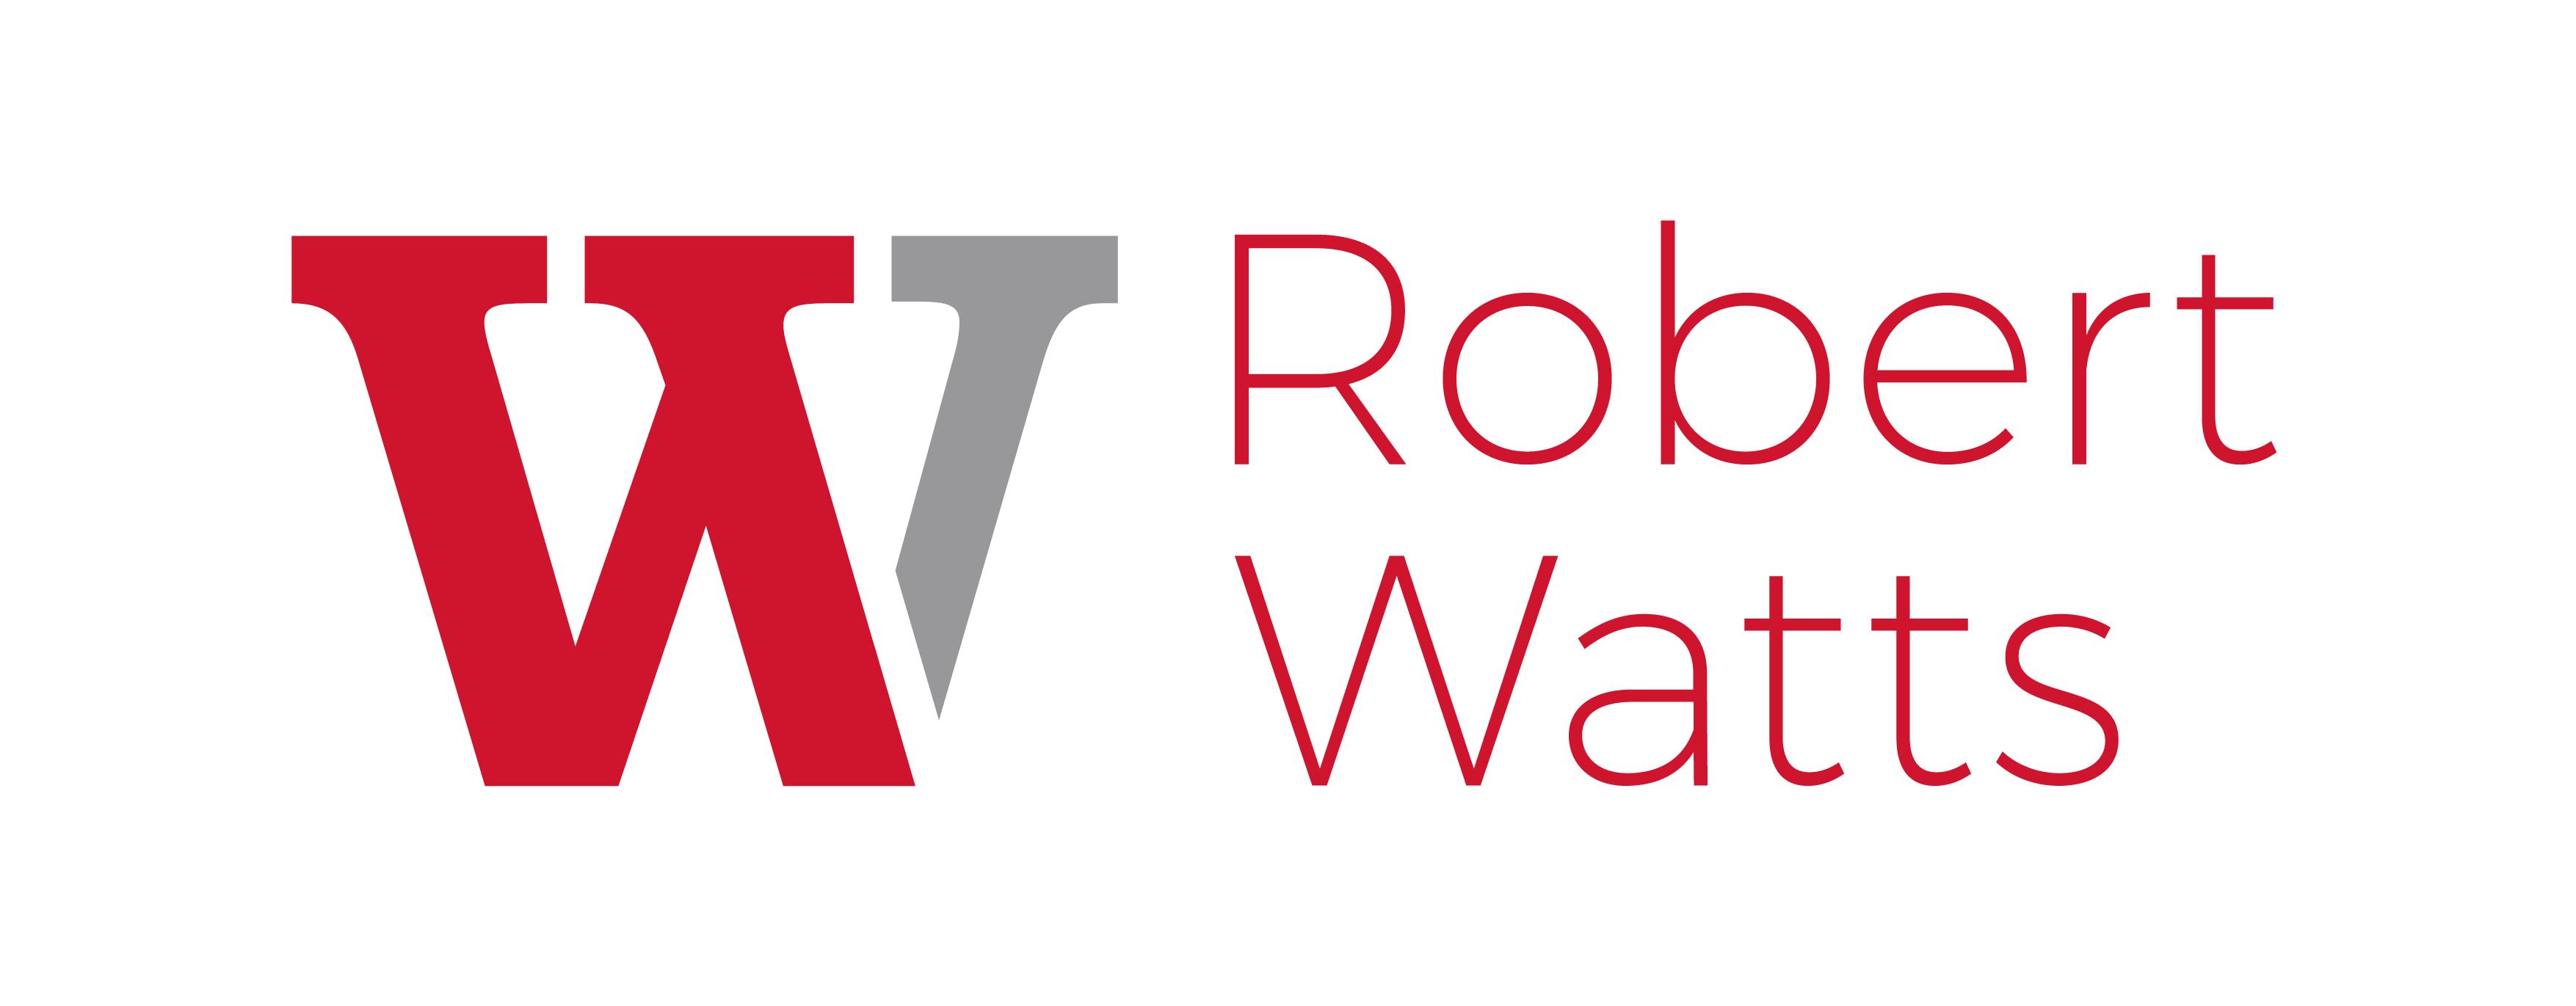 robertwatts